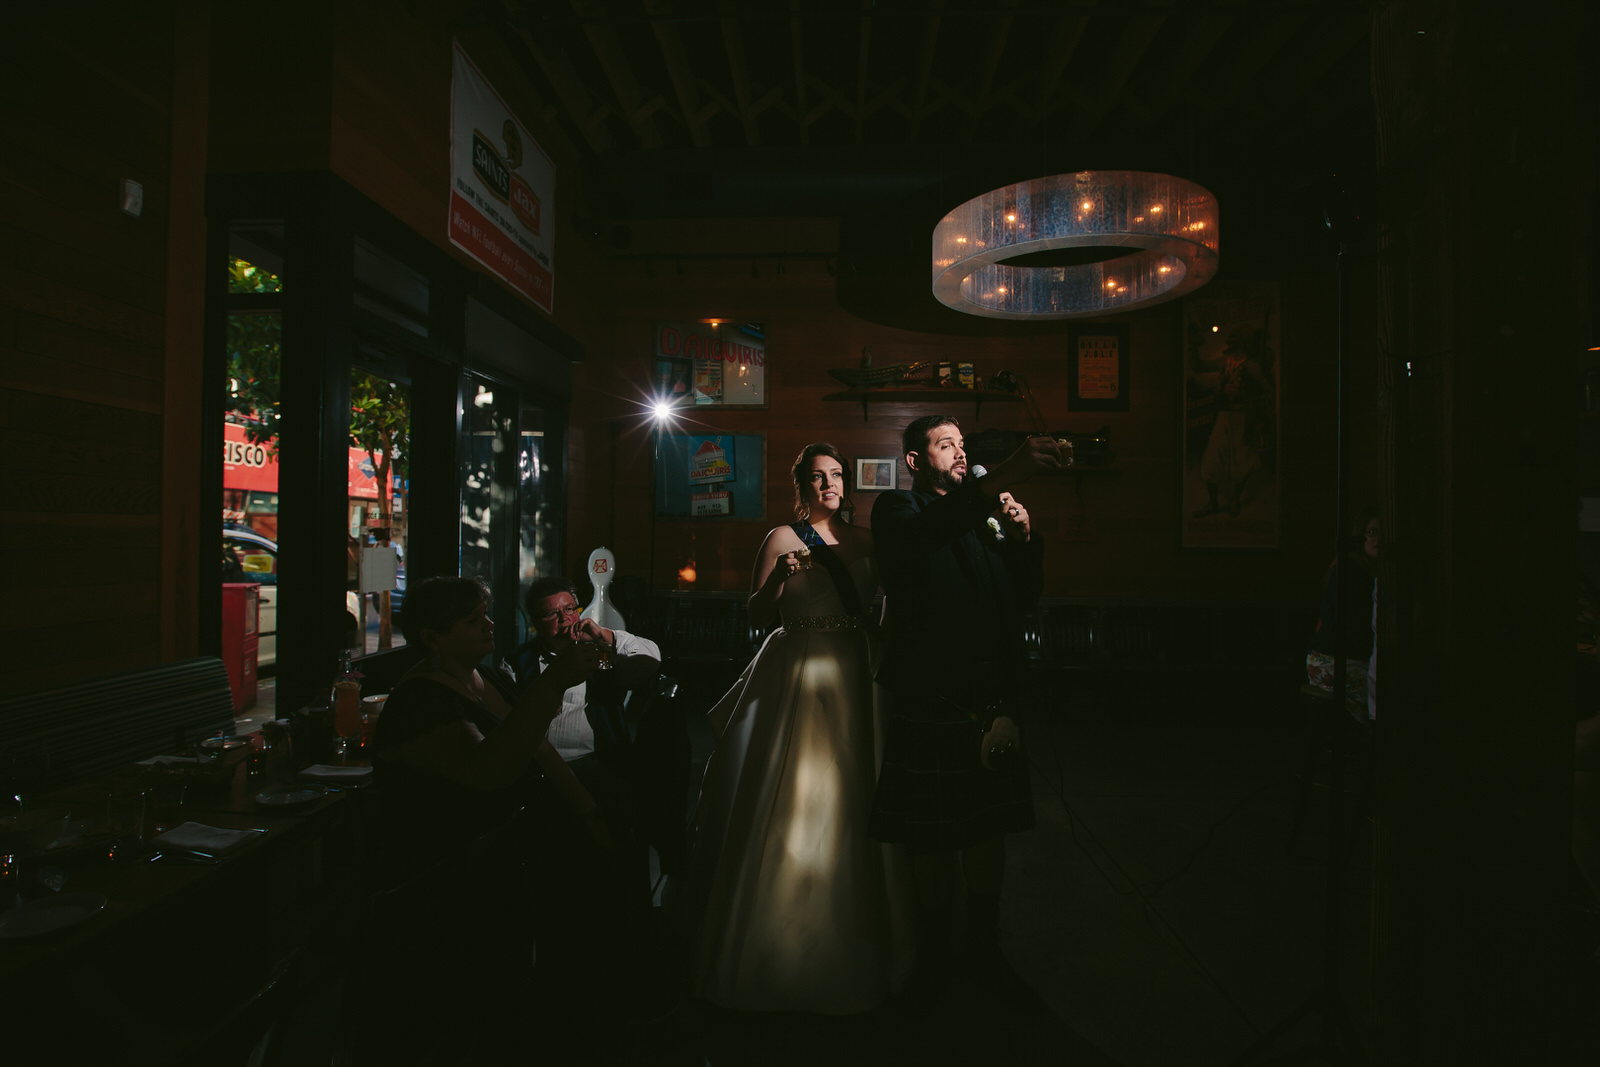 bride_groom_speech_welcome_reception_intimate_wedding.jpg